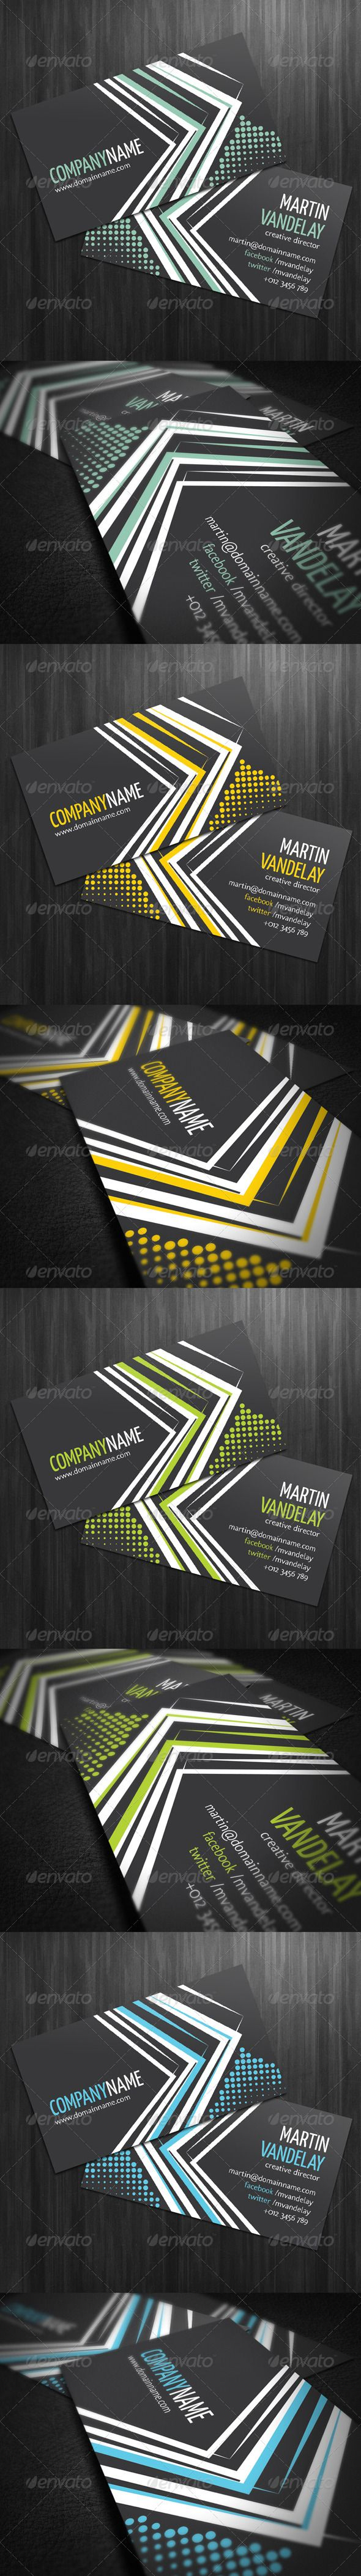 36 best business card design images on pinterest